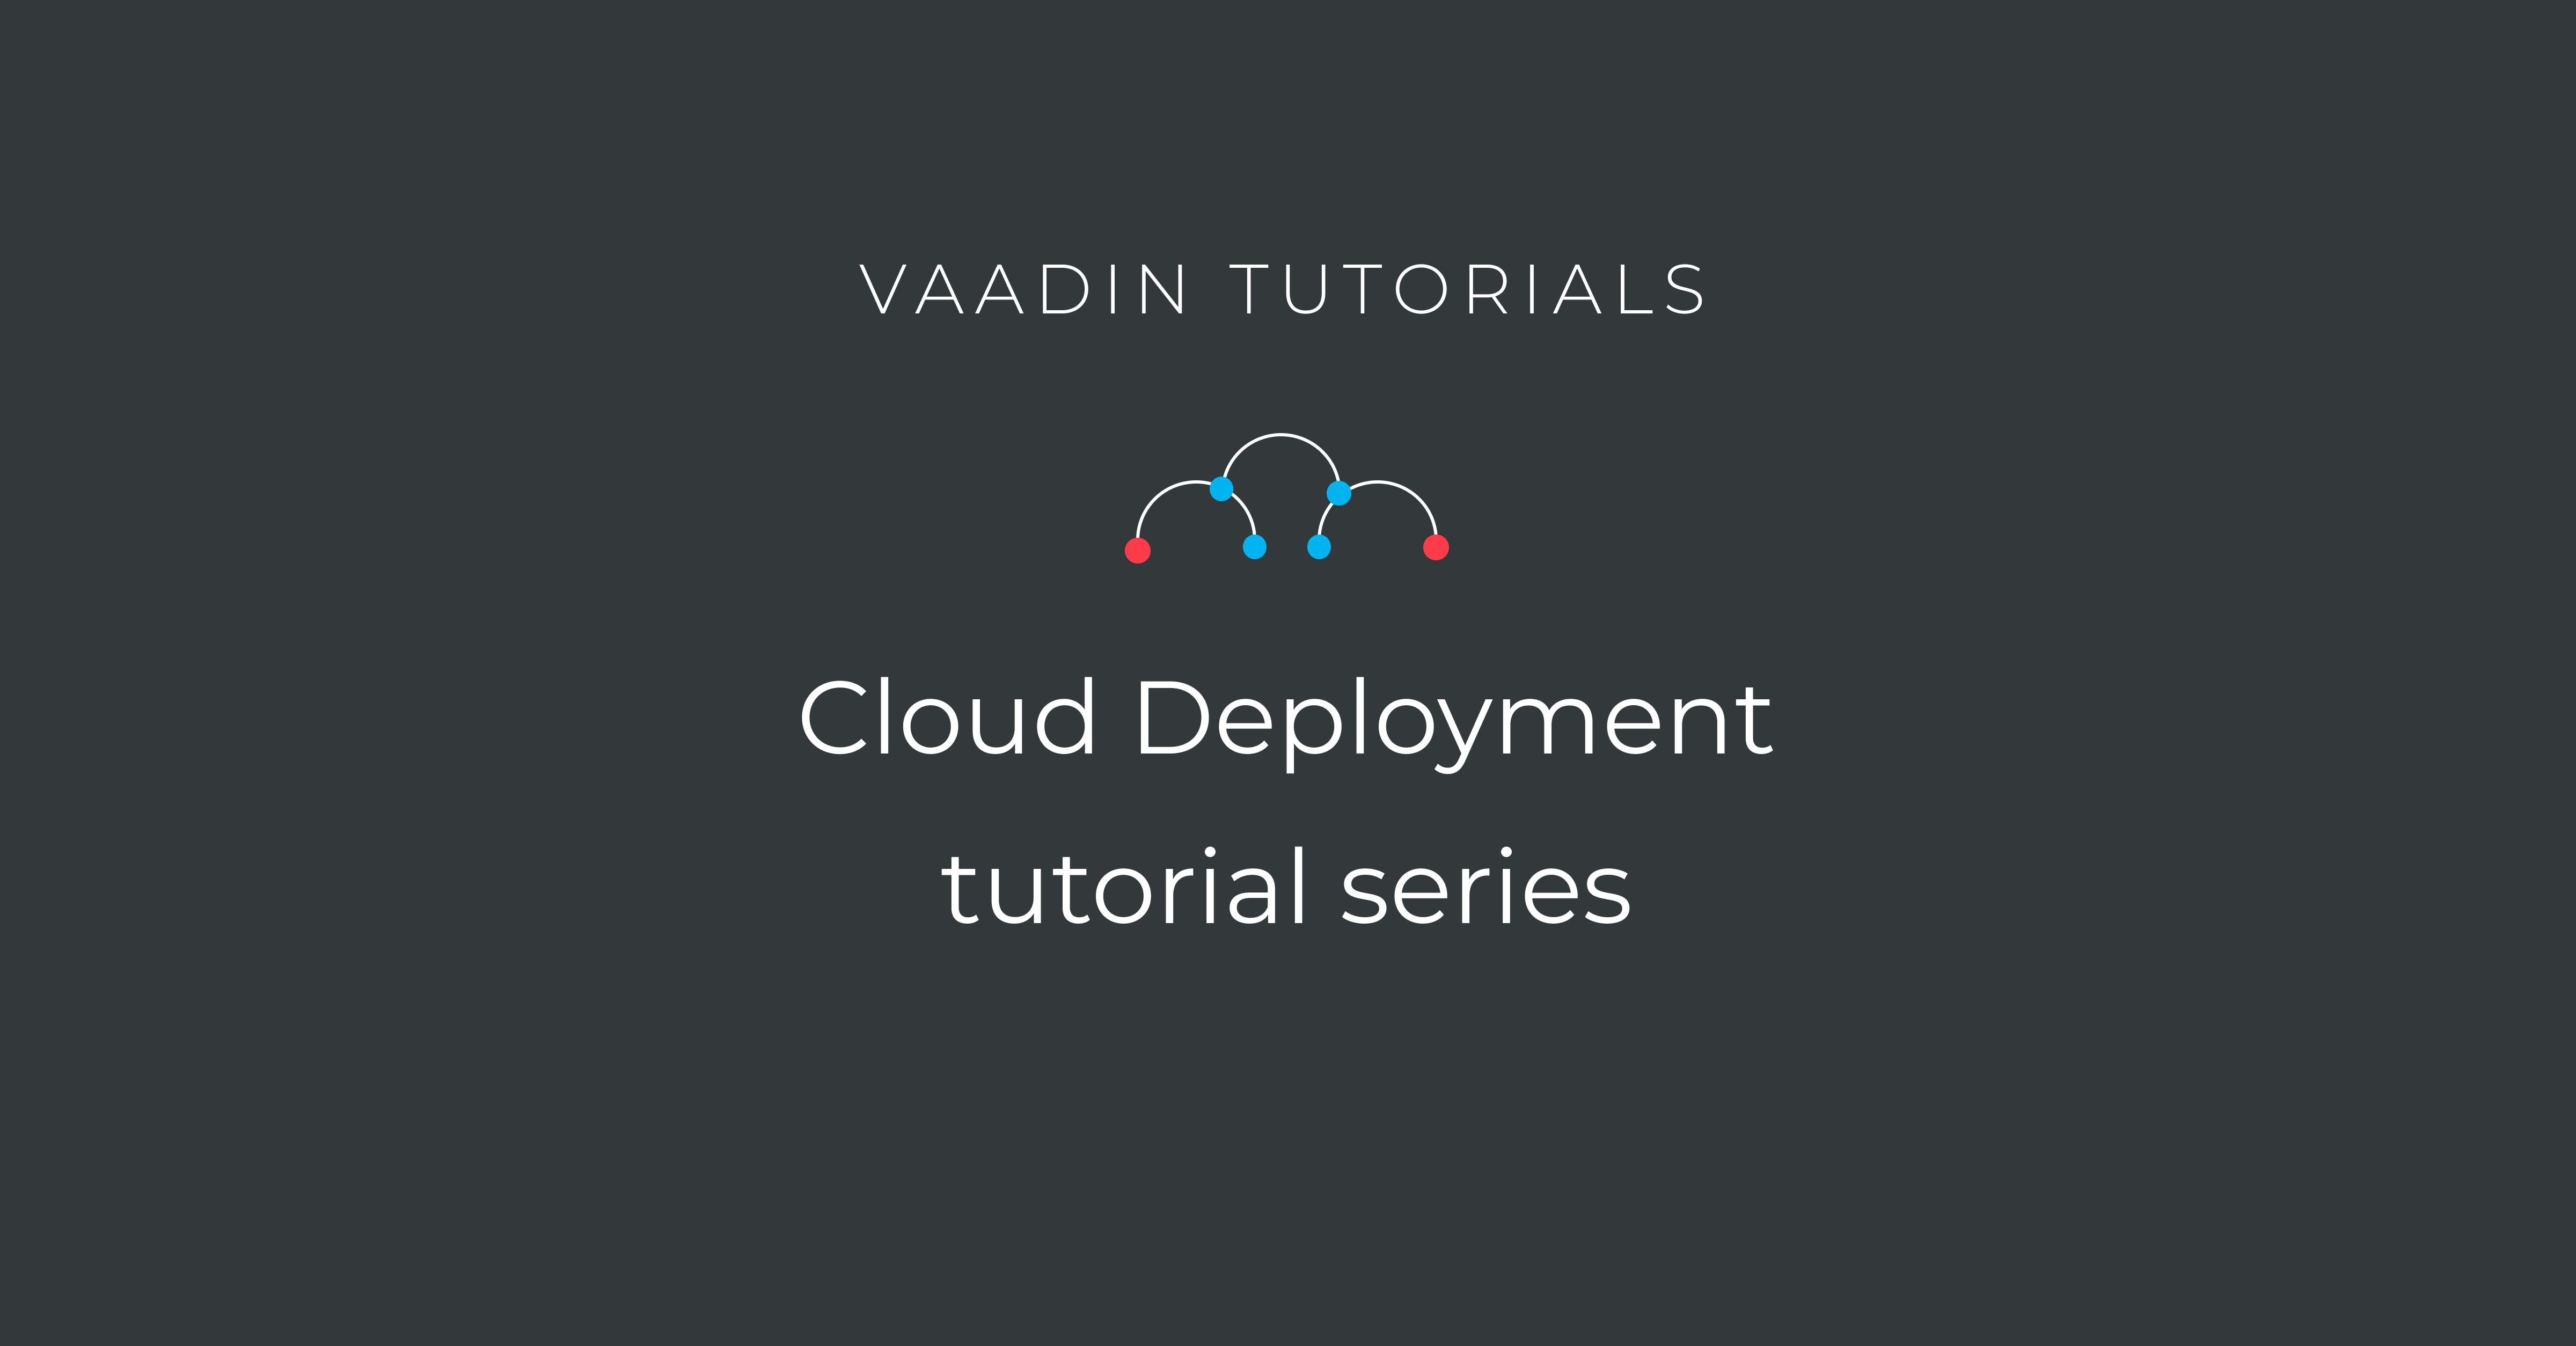 Vaadin cloud deployment tutorials